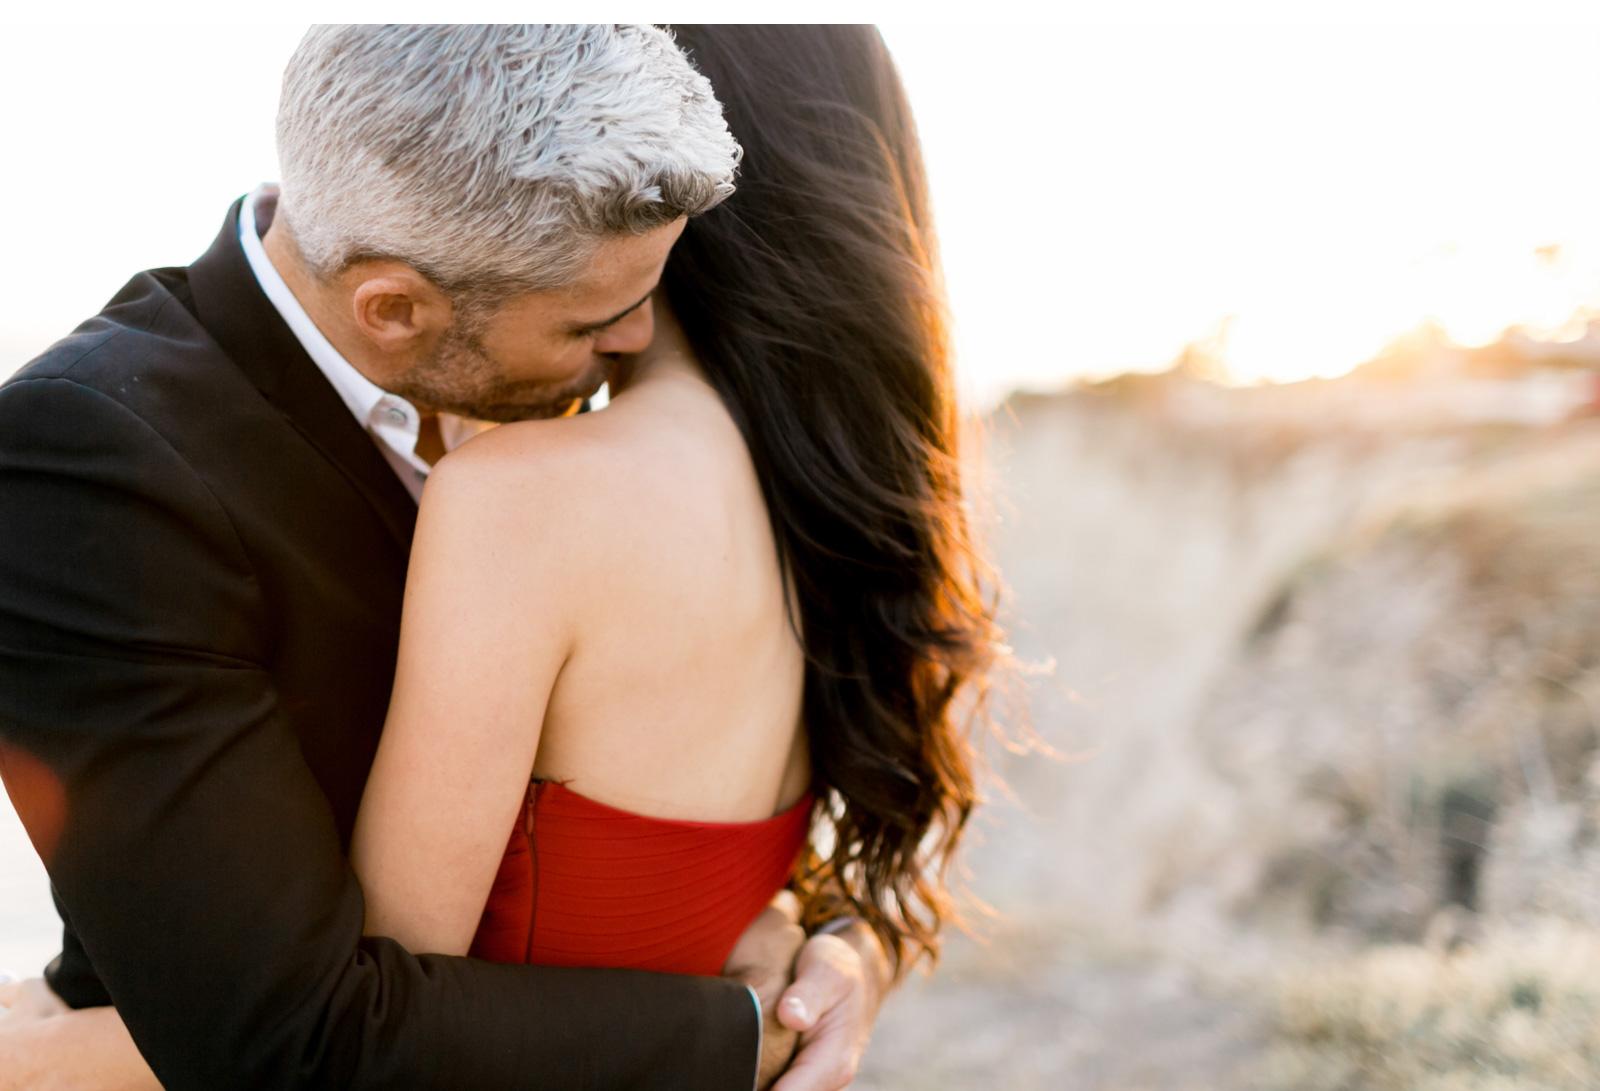 San-Luis-Obispo-Wedding-Photographer-Natalie-Schutt-Photography_04.jpg